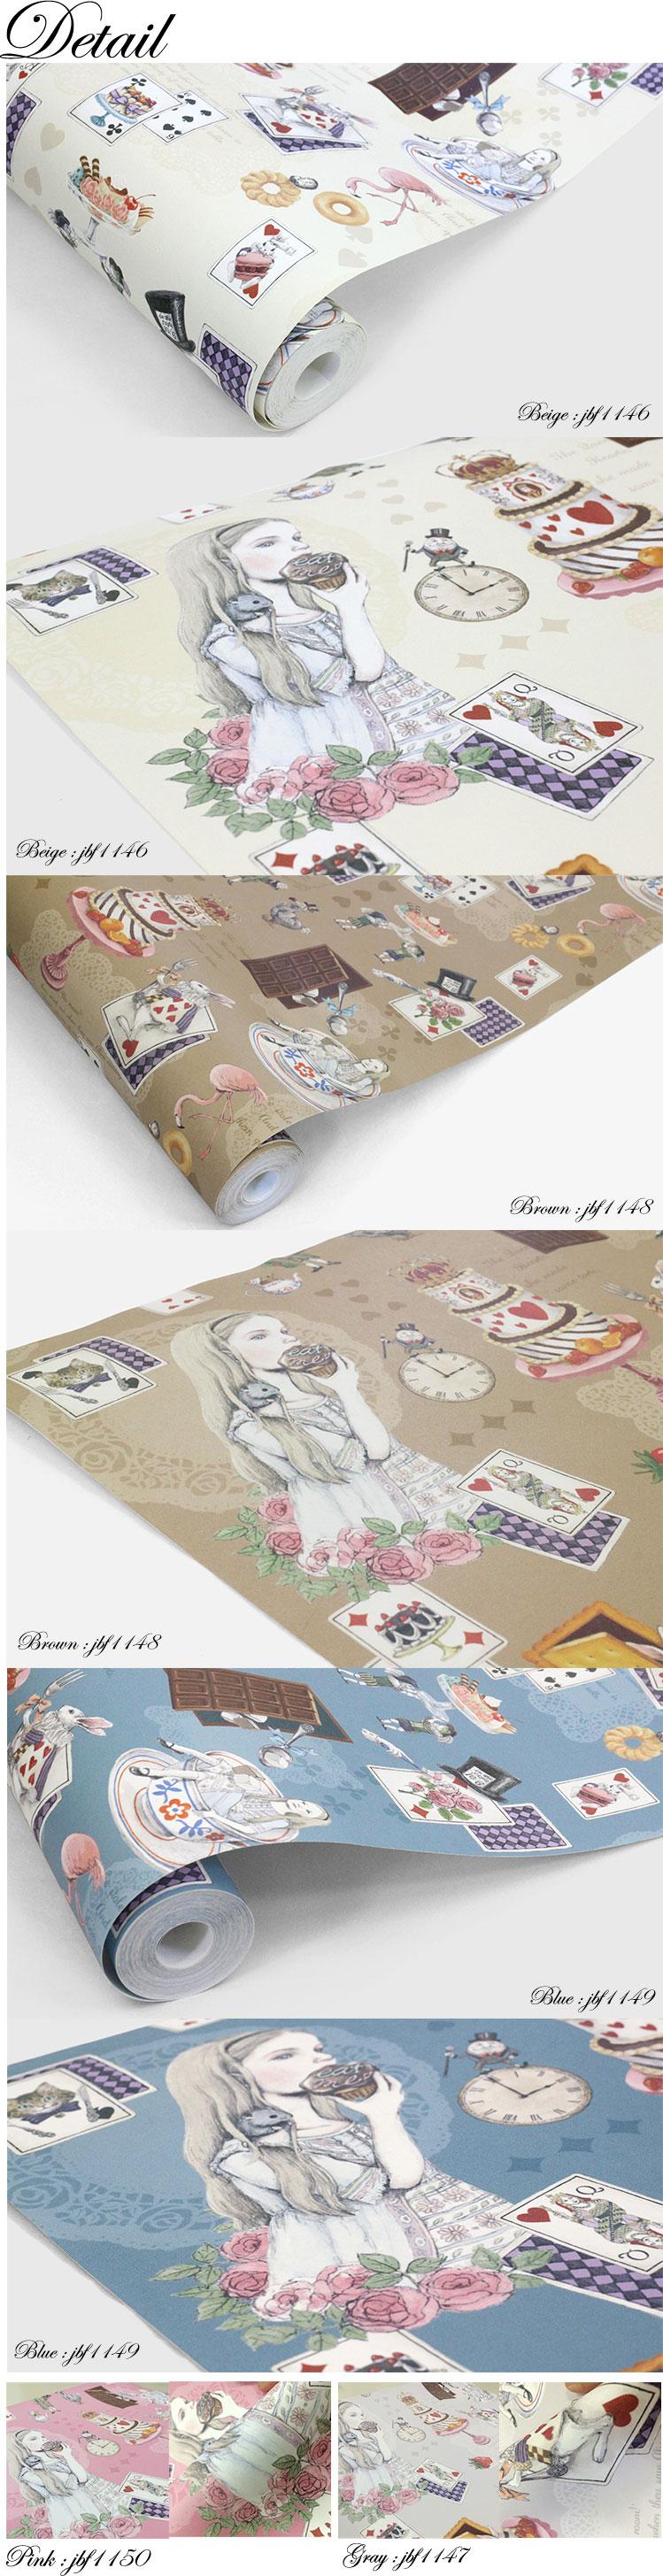 Wonderland Wallpaper, Wallpaper Sweets ~ Candy Wonderland Of Fellowpeel  Off Wallpaper Digital Print